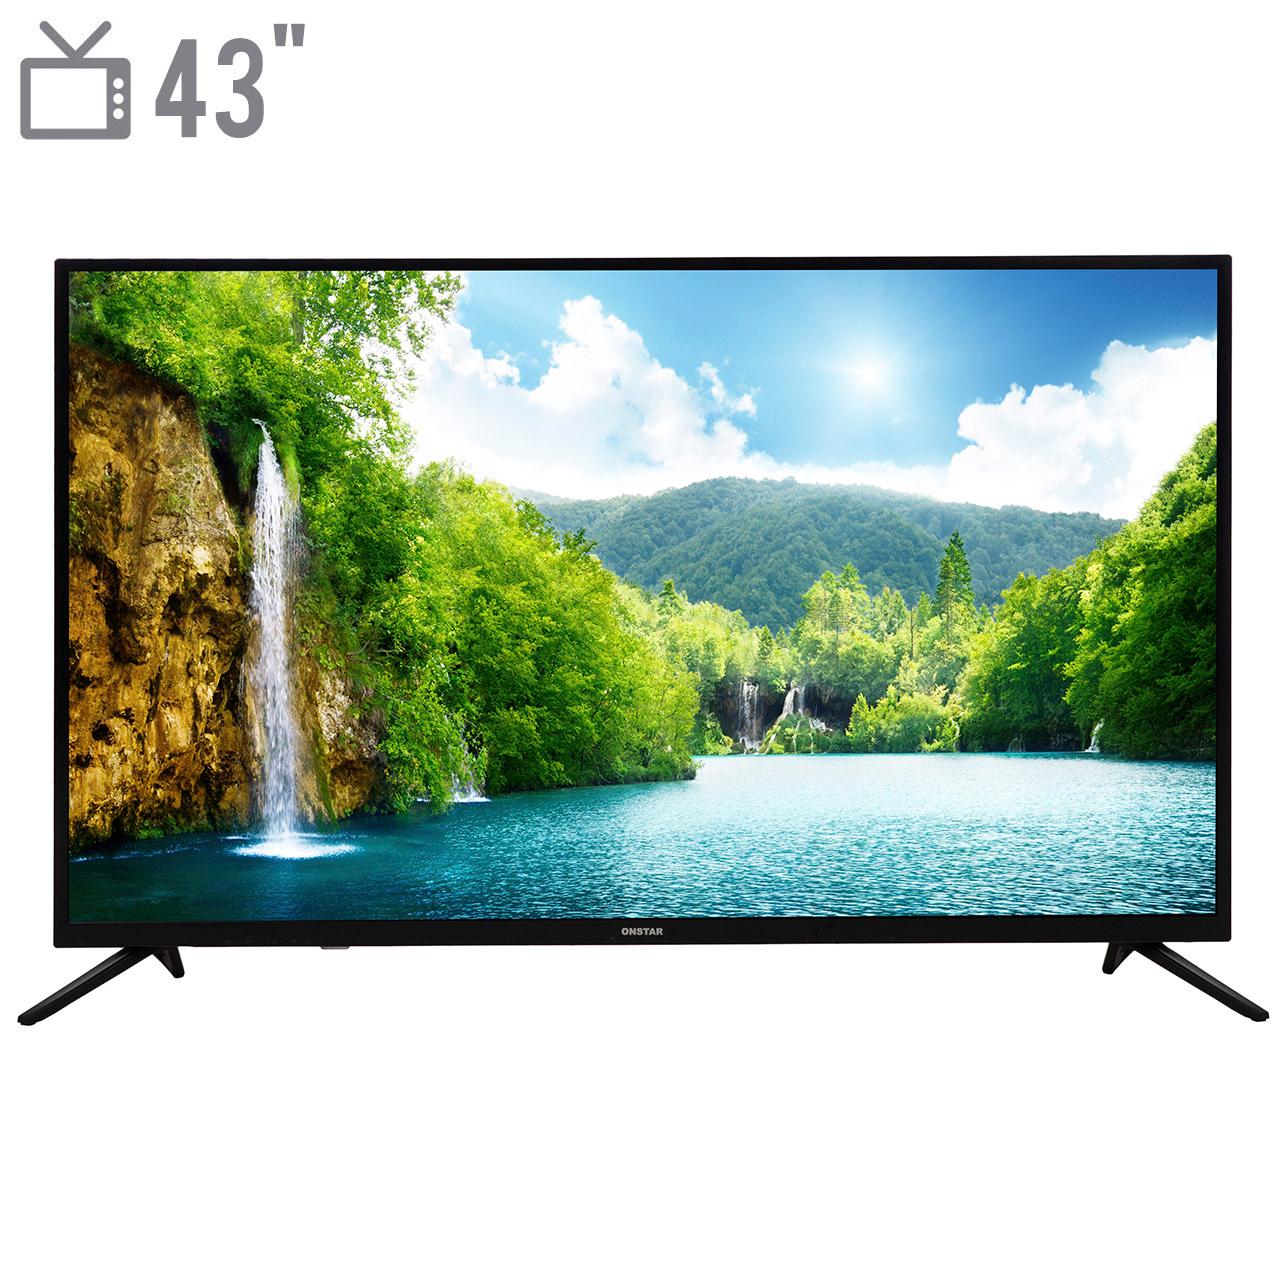 تلویزیون ال ای دی آنستار مدل OS43N9200 سایز 43 اینچ